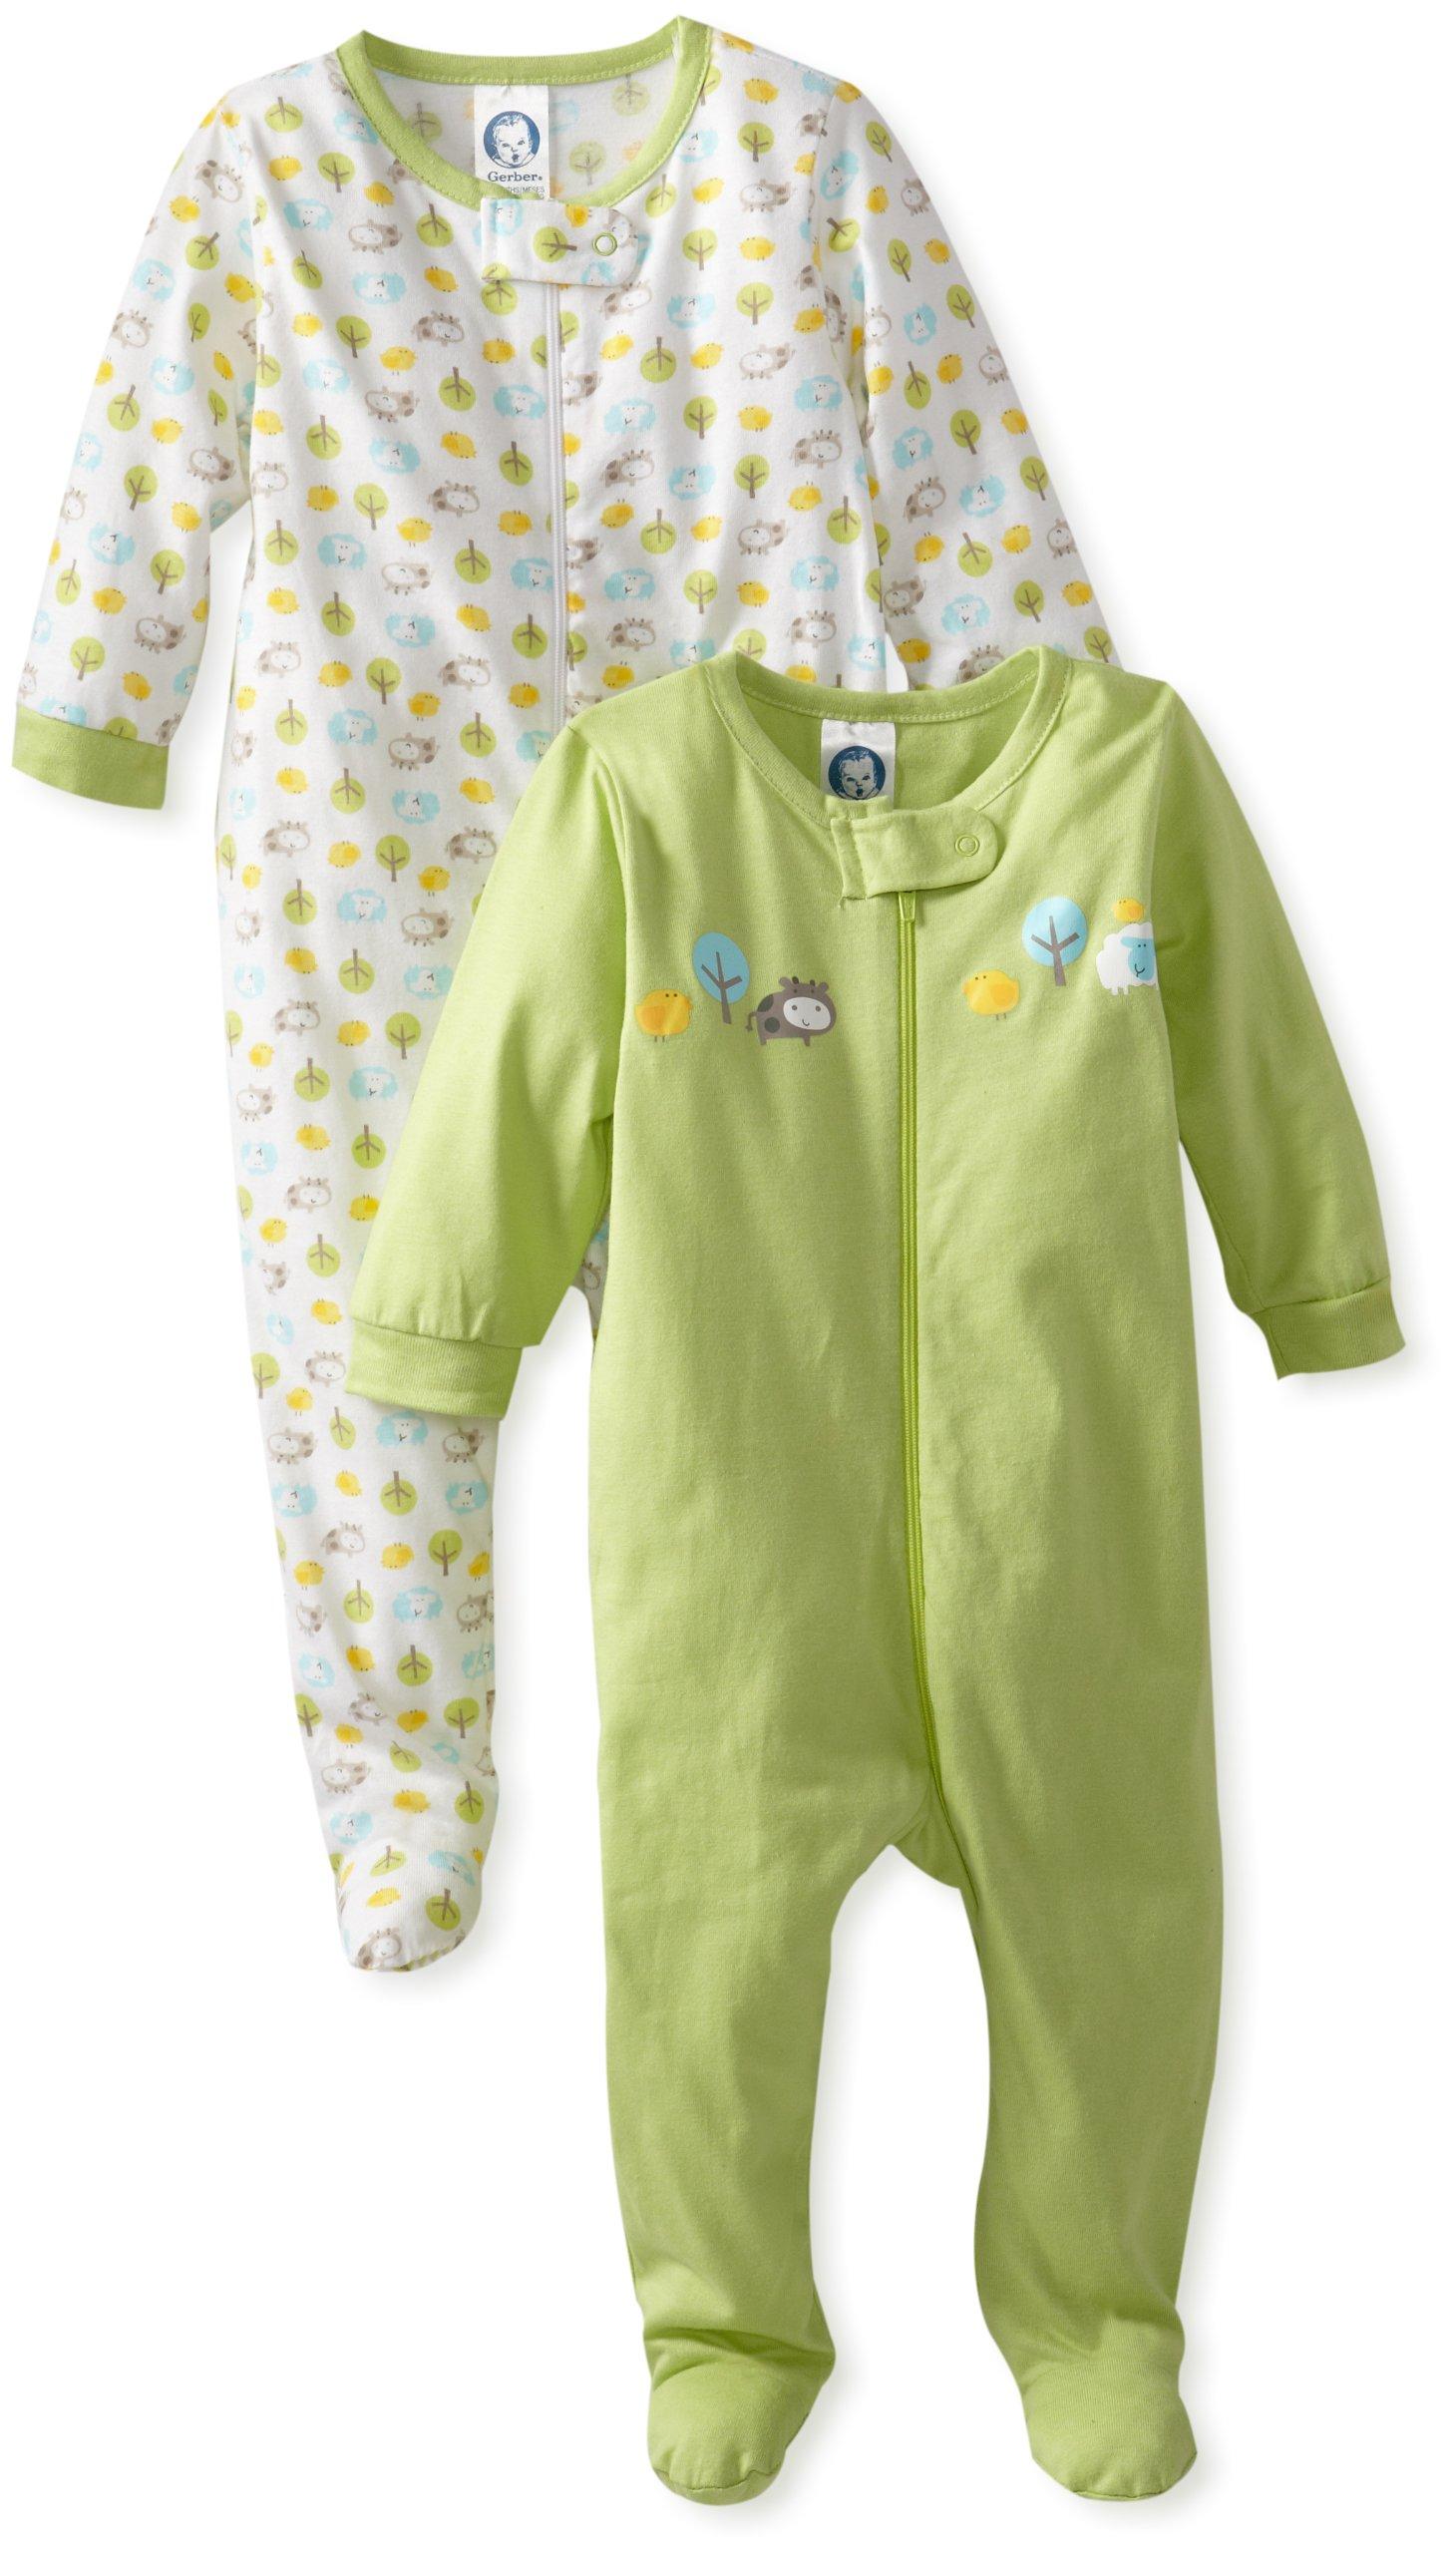 Gerber Unisex Baby 2 Pack Zip Front Sleep 'N Play, Animals Green, 3-6 Months